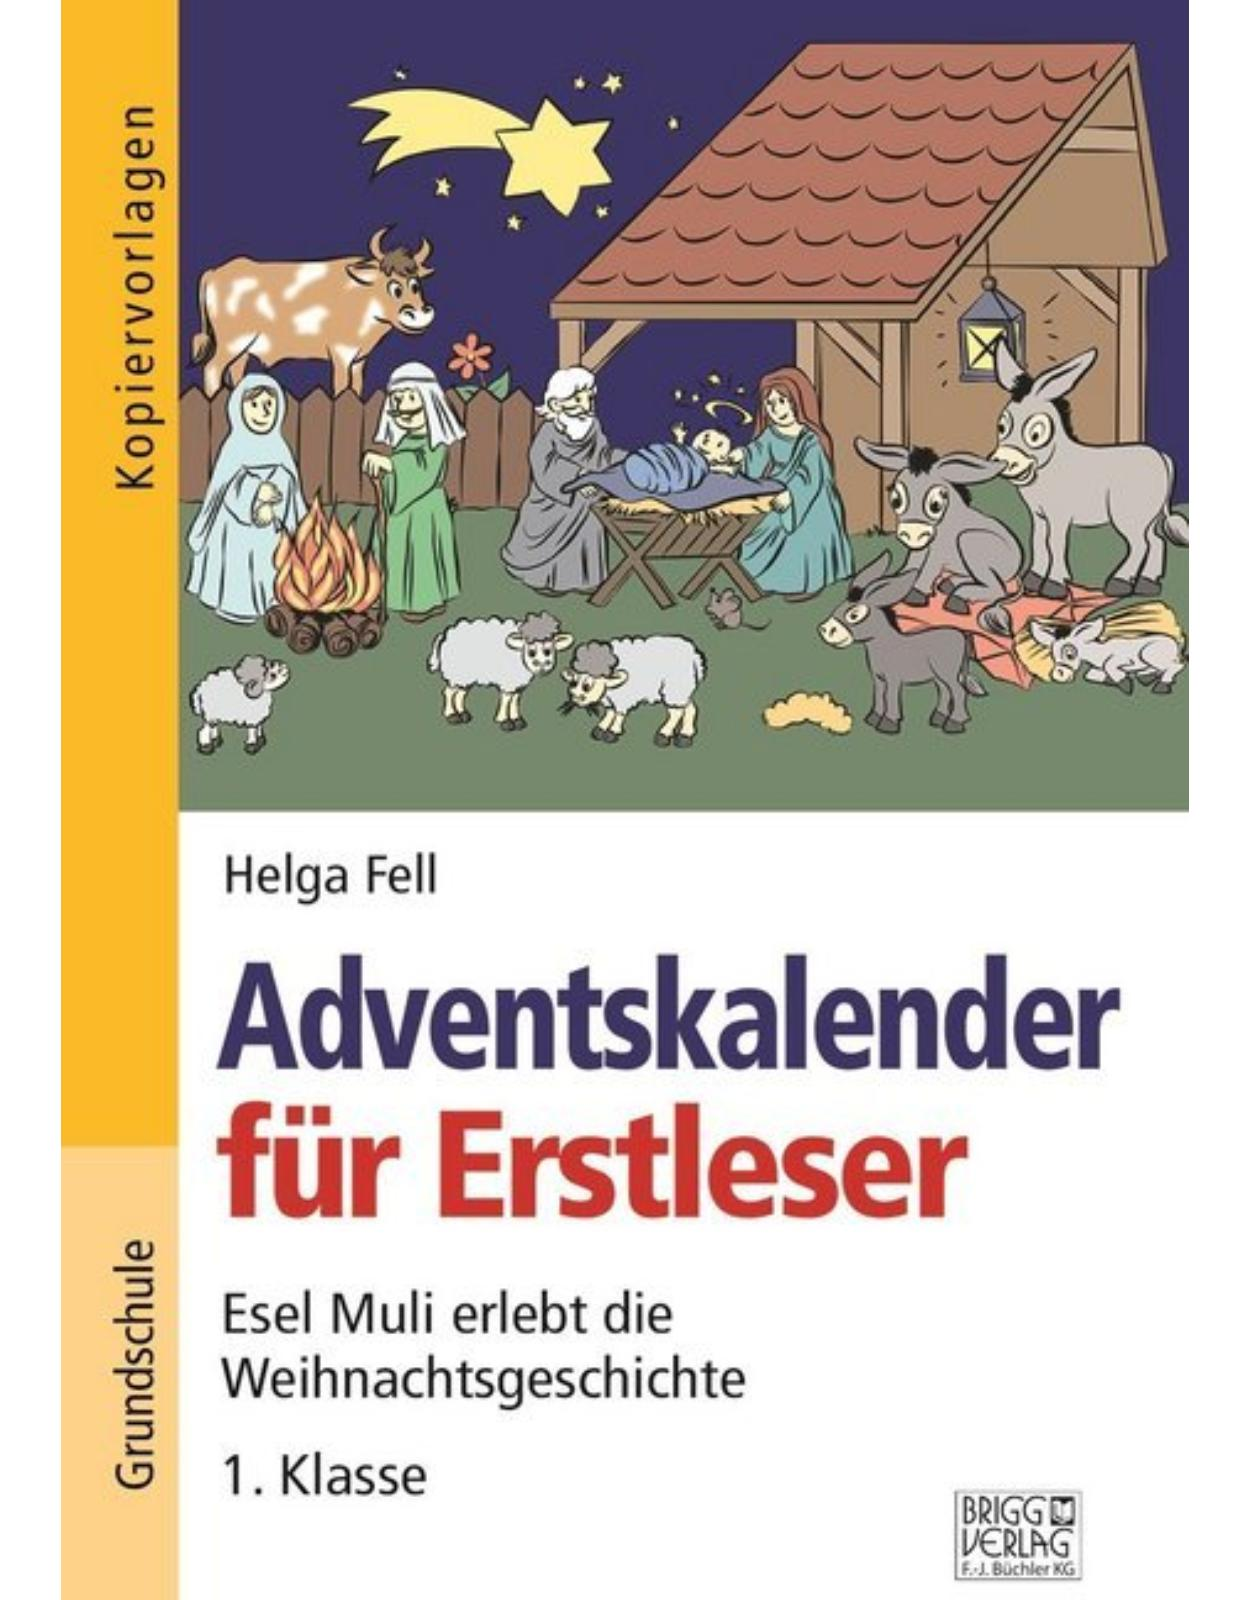 Adventskalender fur Erstleser